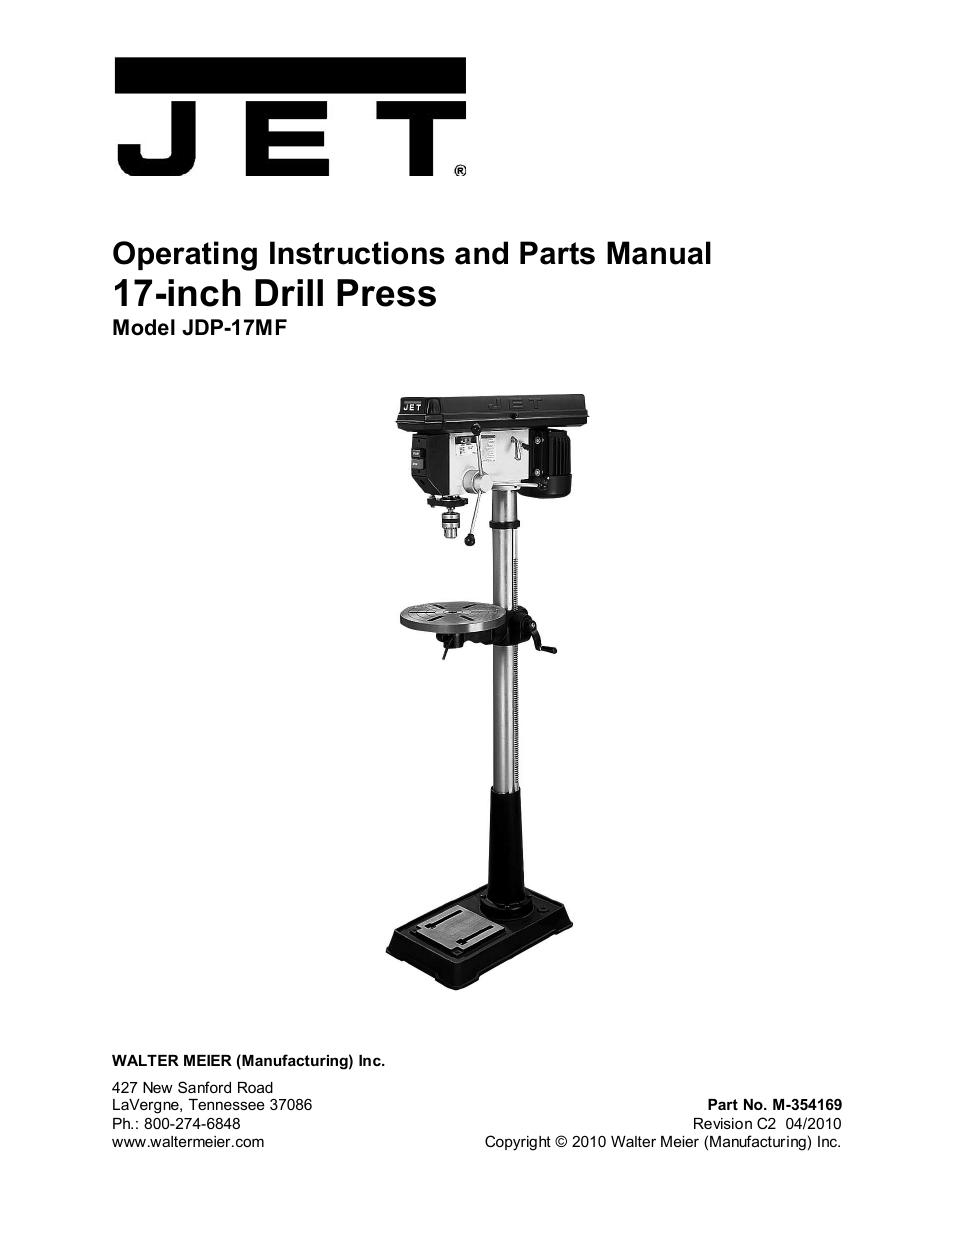 jet tools jdp 17mf user manual 24 pages rh manualsdir com jet power tools manuals jet tools owners manuals